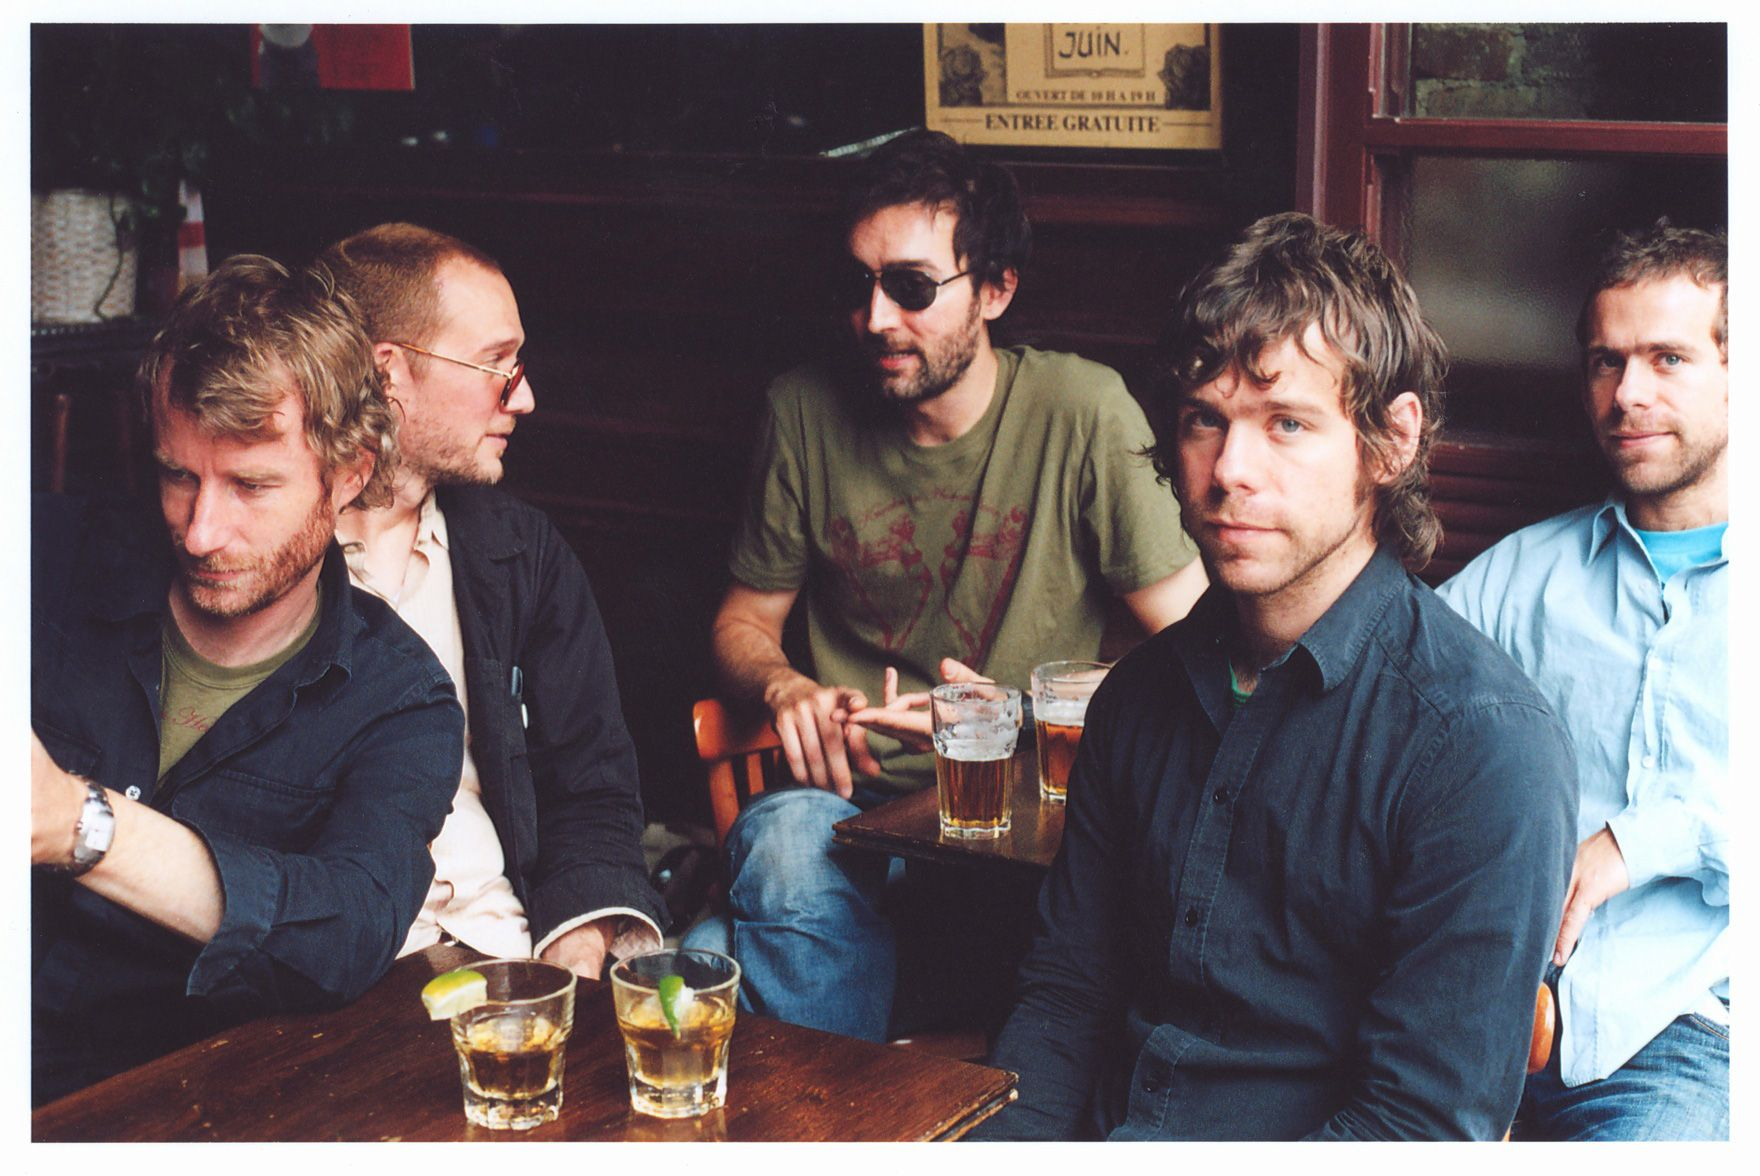 The National skal på turne sammen med R.E.M. til sommeren.